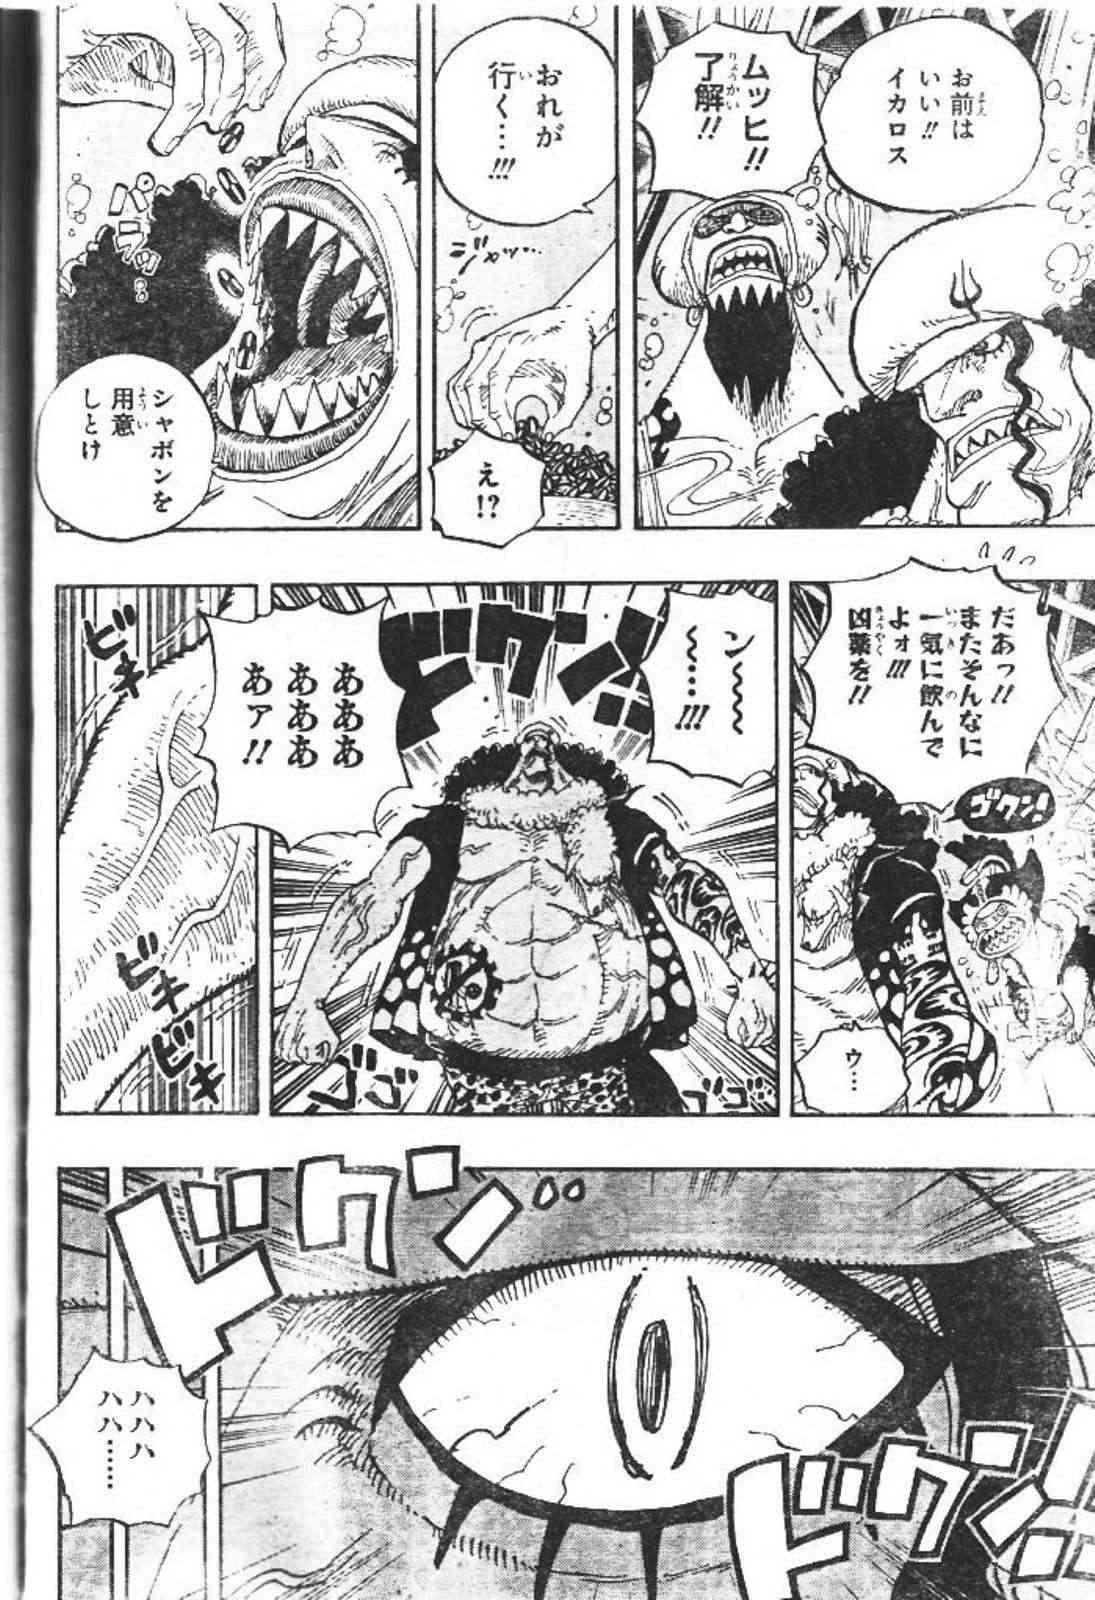 One Piece Manga 611 Spoiler Pics 06_raw10